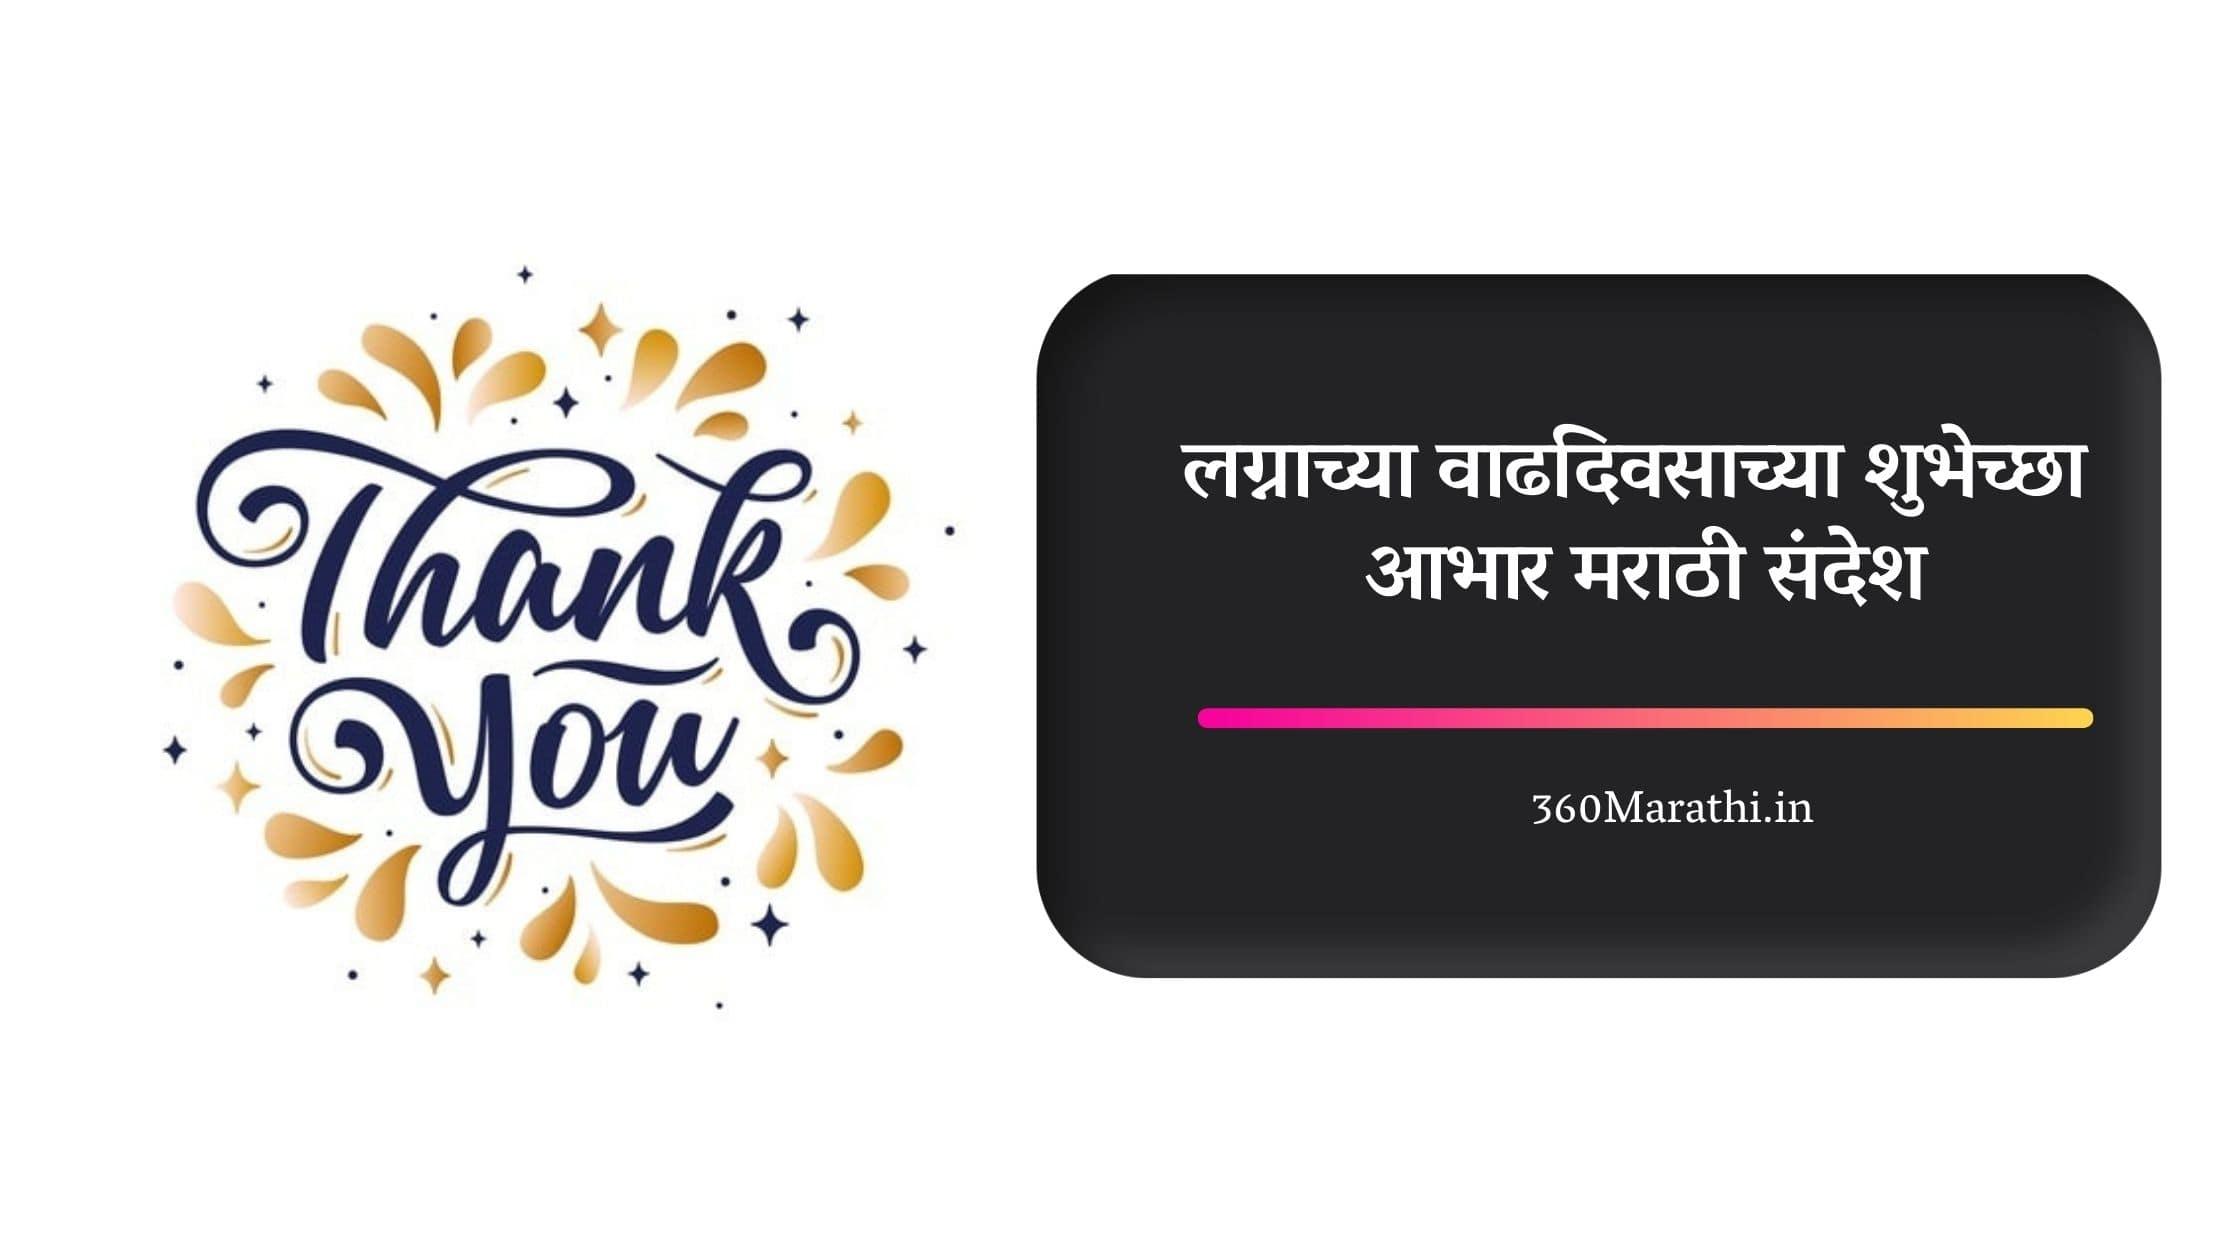 Thanks for Anniversary Wishes in Marathi | लग्नाच्या वाढदिवसाच्या शुभेच्छा आभार मराठी संदेश